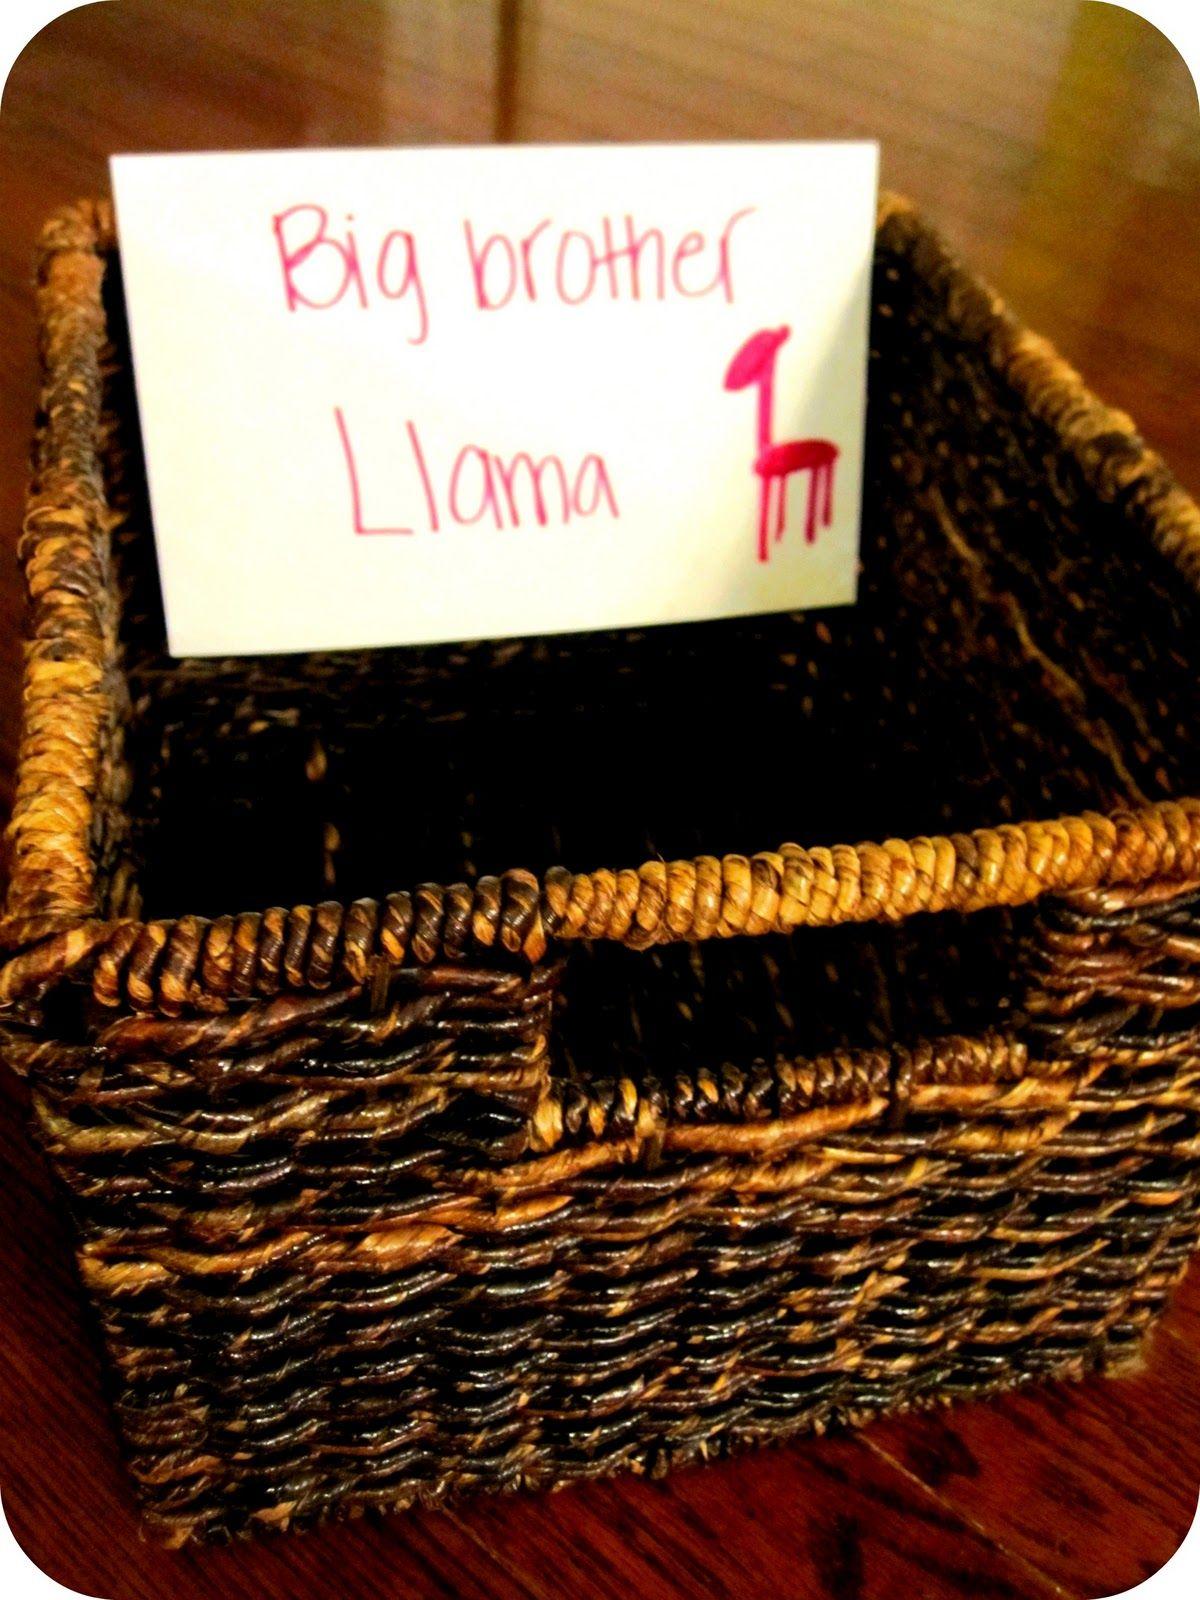 Llama Llama Red Pajama Pj Sorting